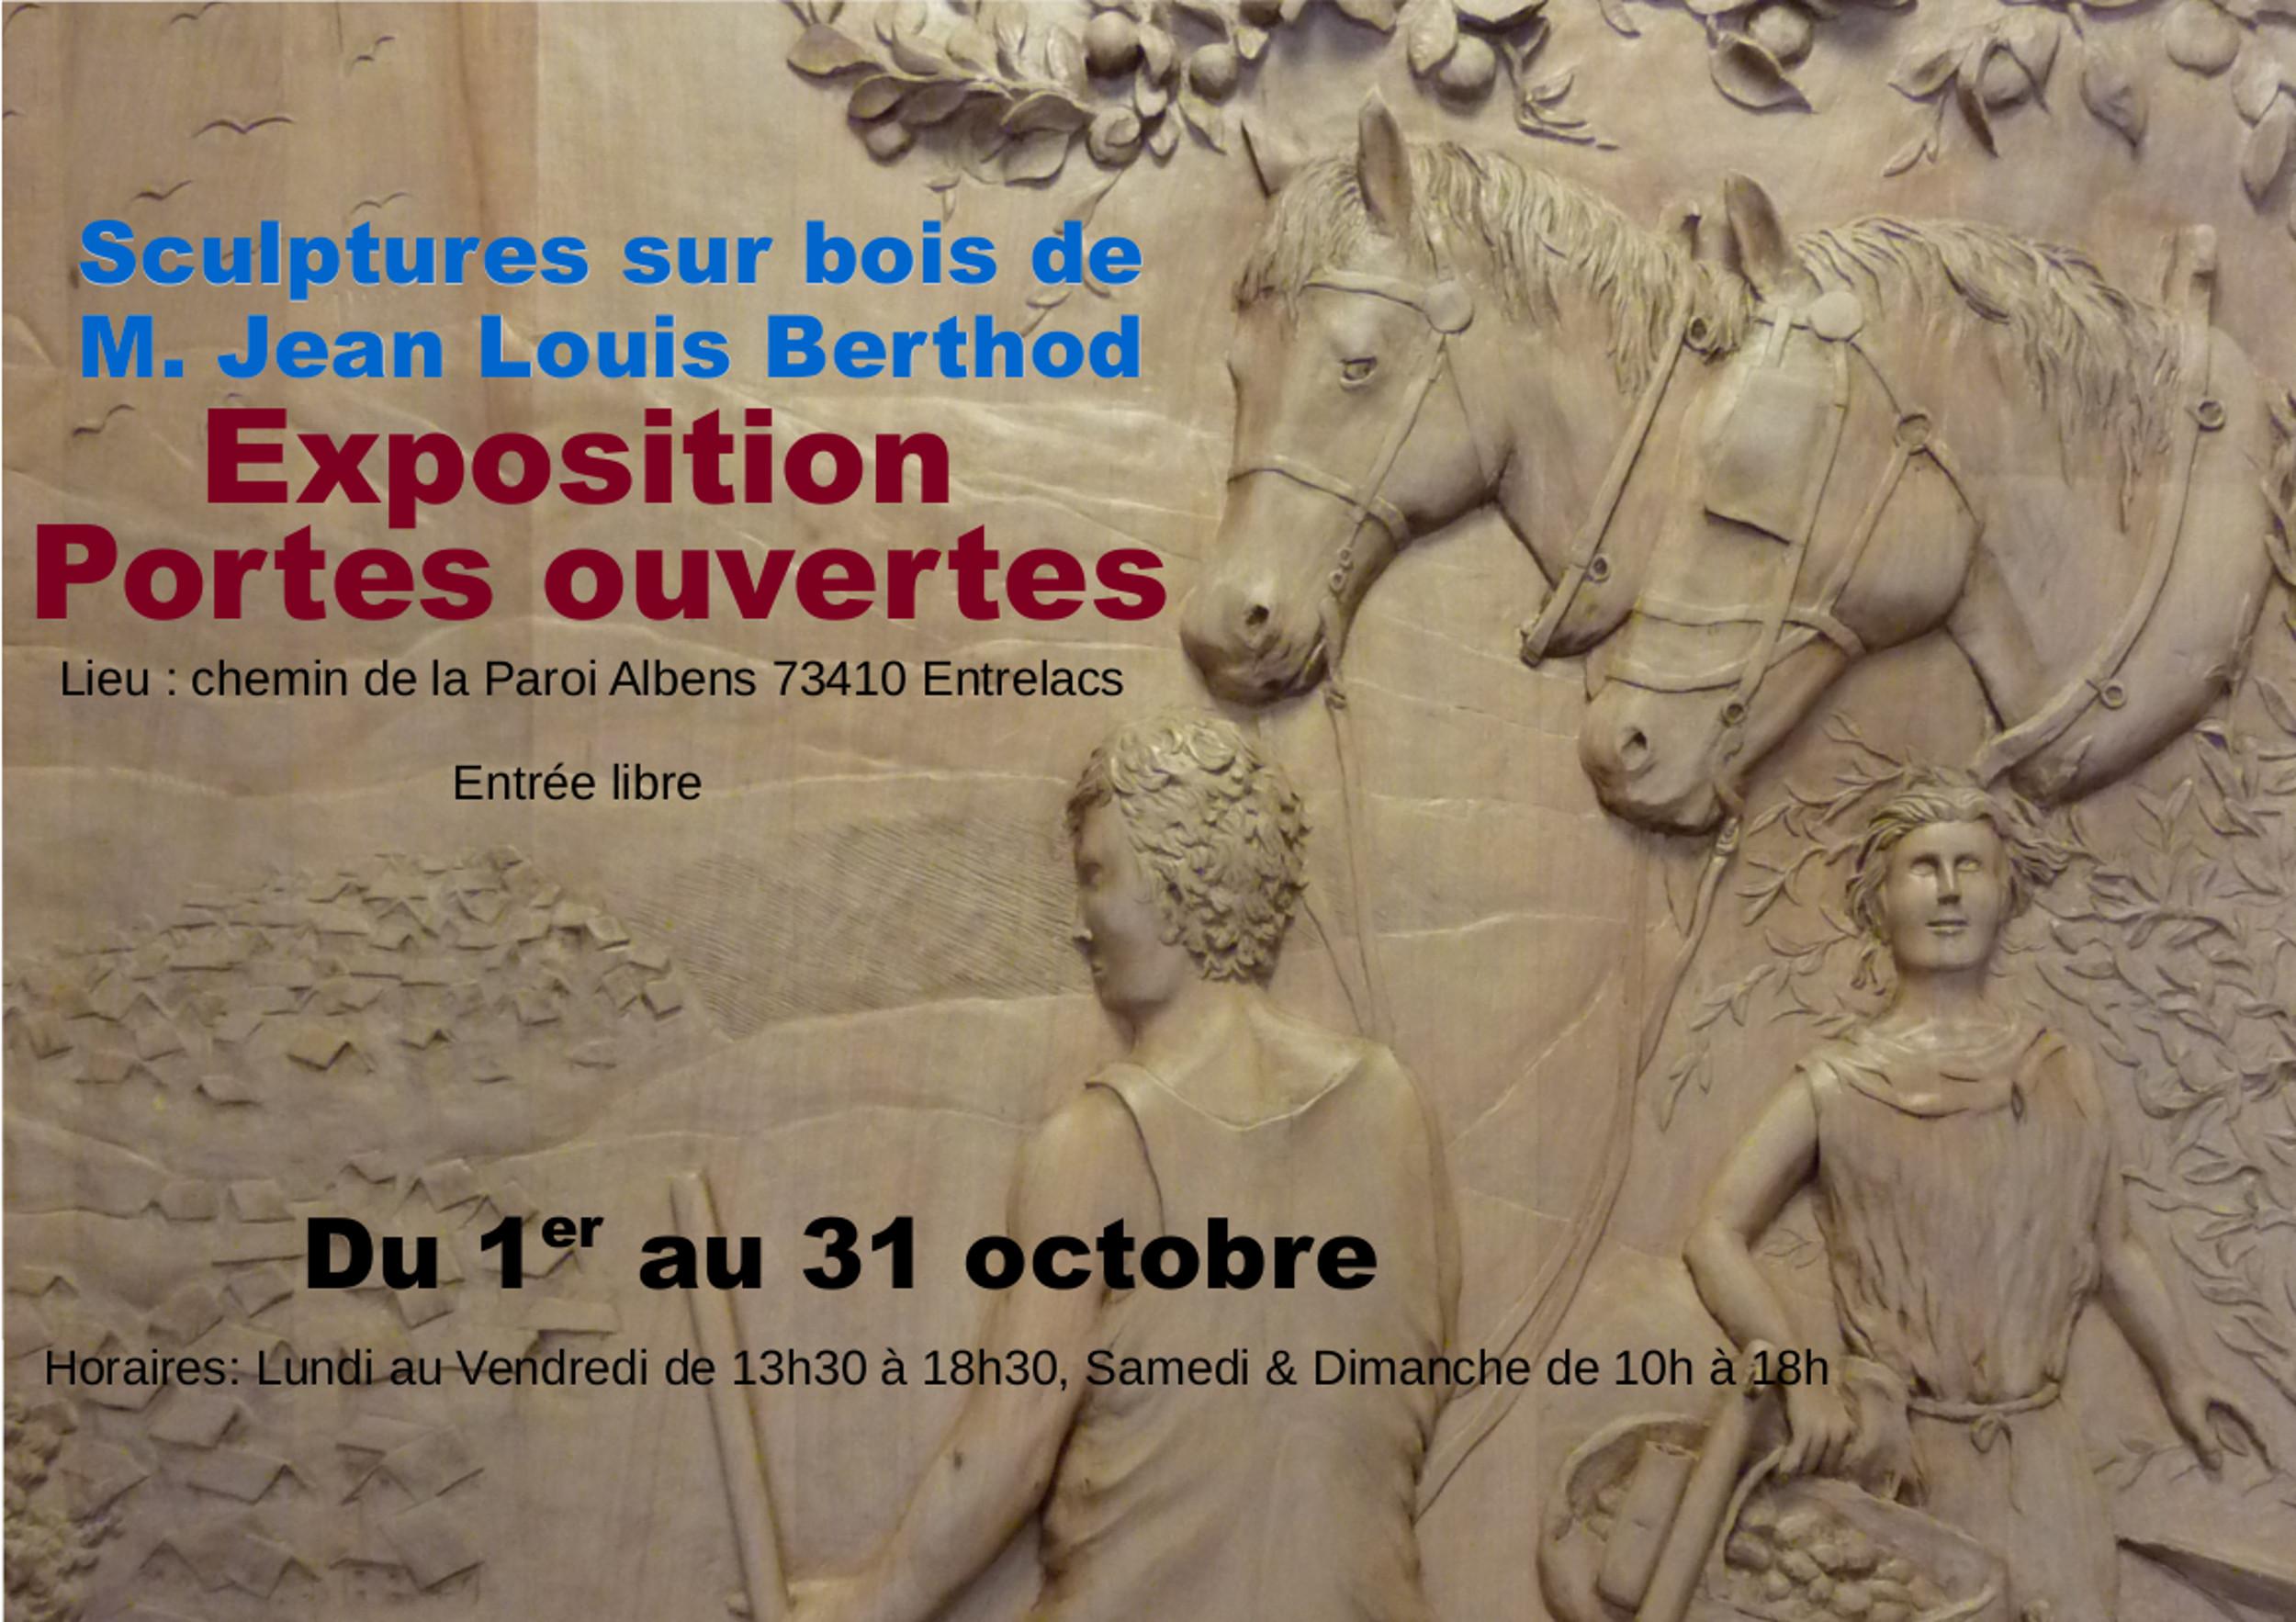 Exposition Jean-Louis Berthod - 01/10 au 31/10/2016 - SAVOIE 735502afficheexpositionetportesouvertesalatelierdesculpturessurboisdemjeanlouisberthod